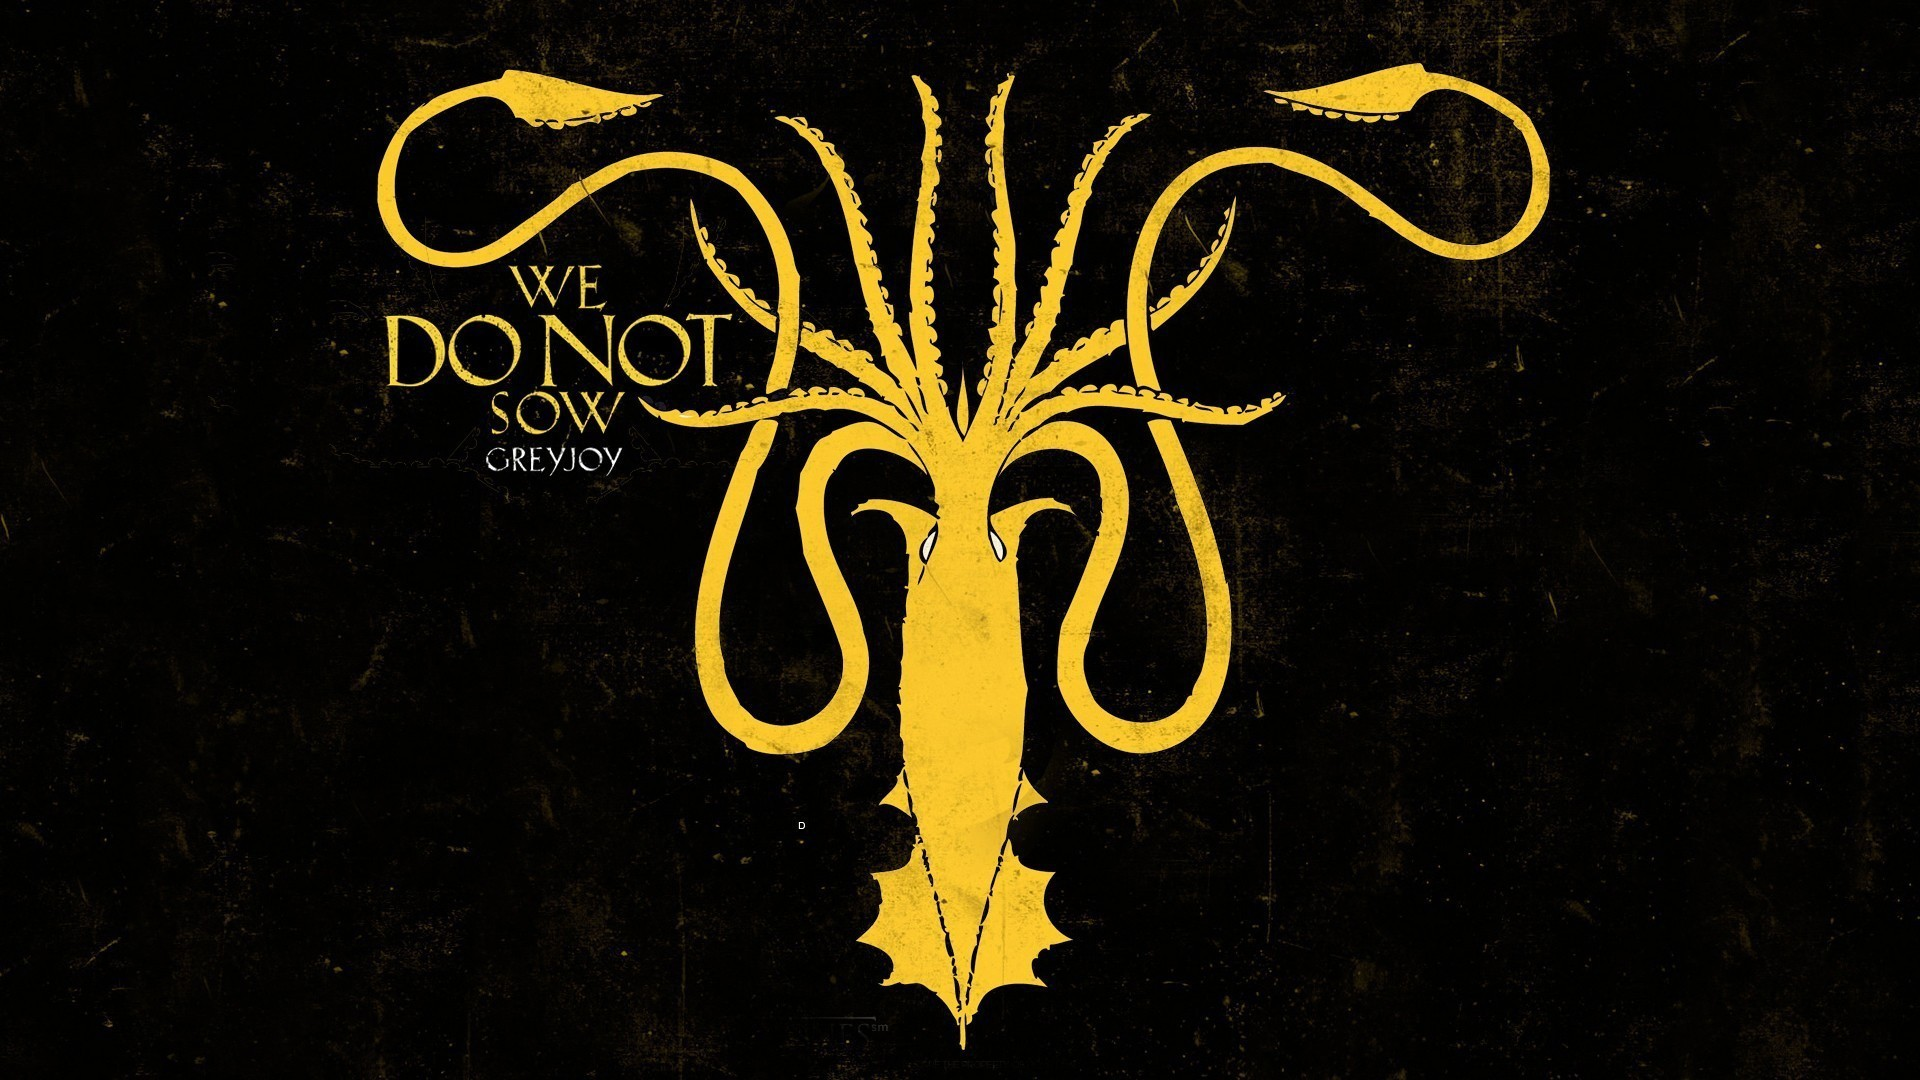 Game of thrones house greyjoy squid